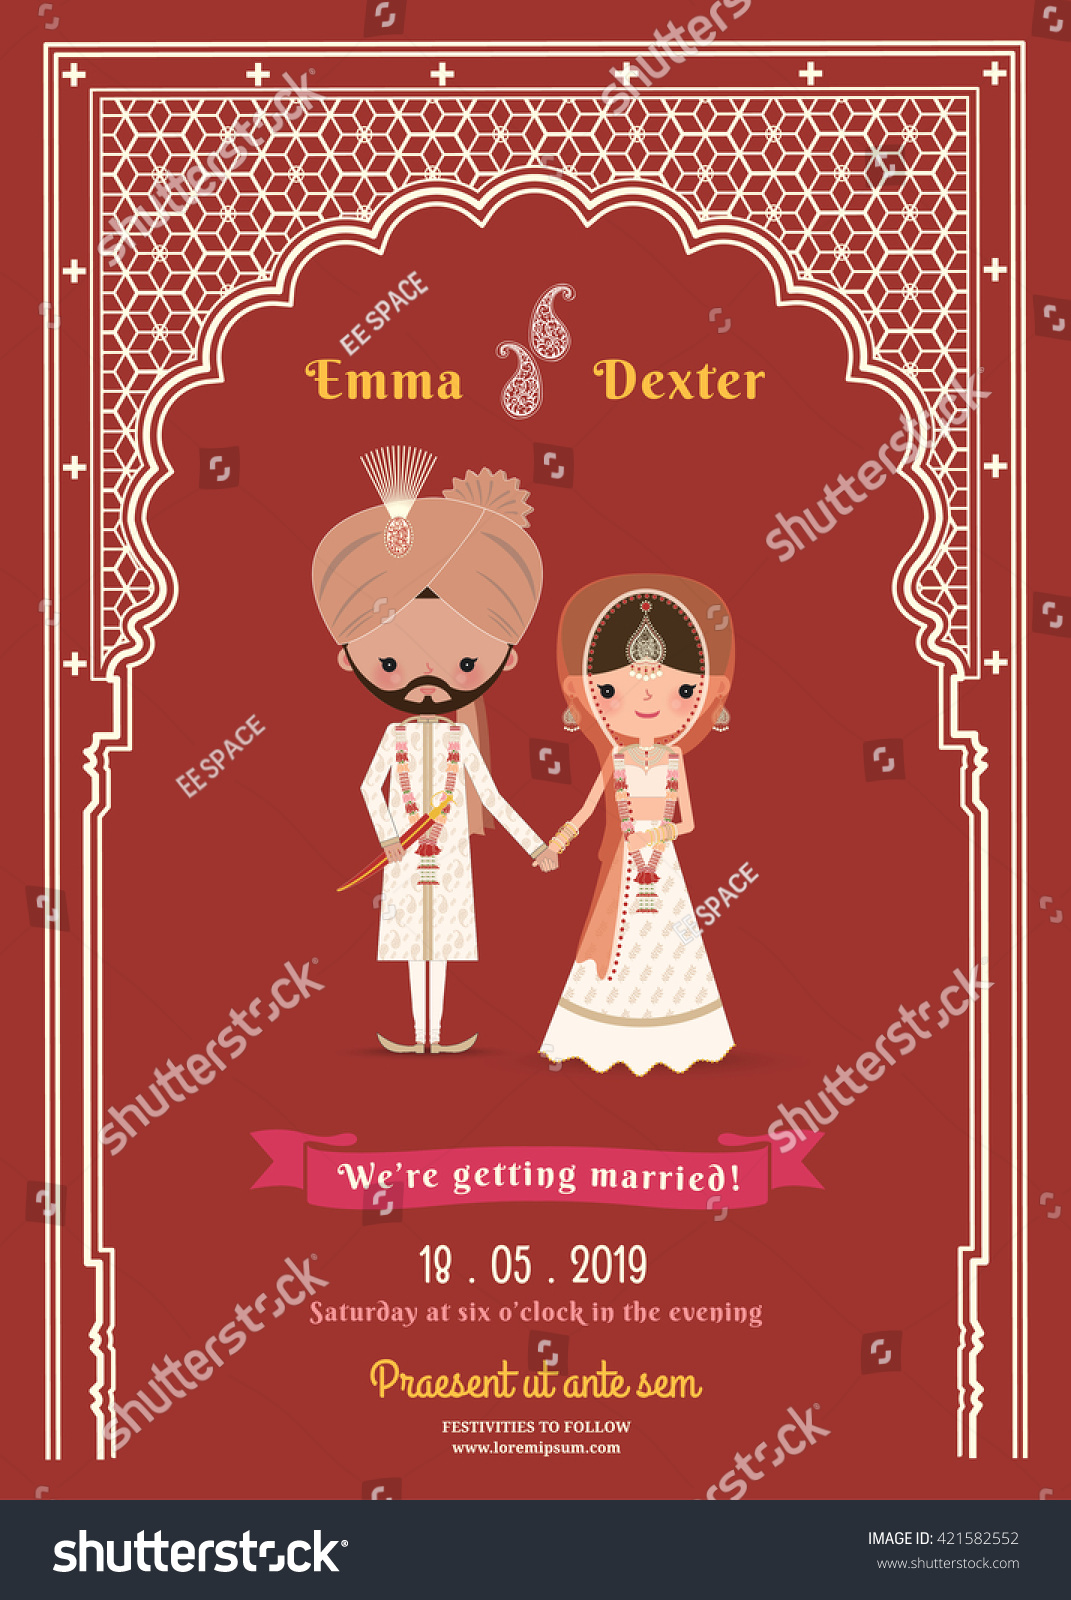 Indian Wedding Bride Groom Cartoon Save Stock Vector 421582552 ...